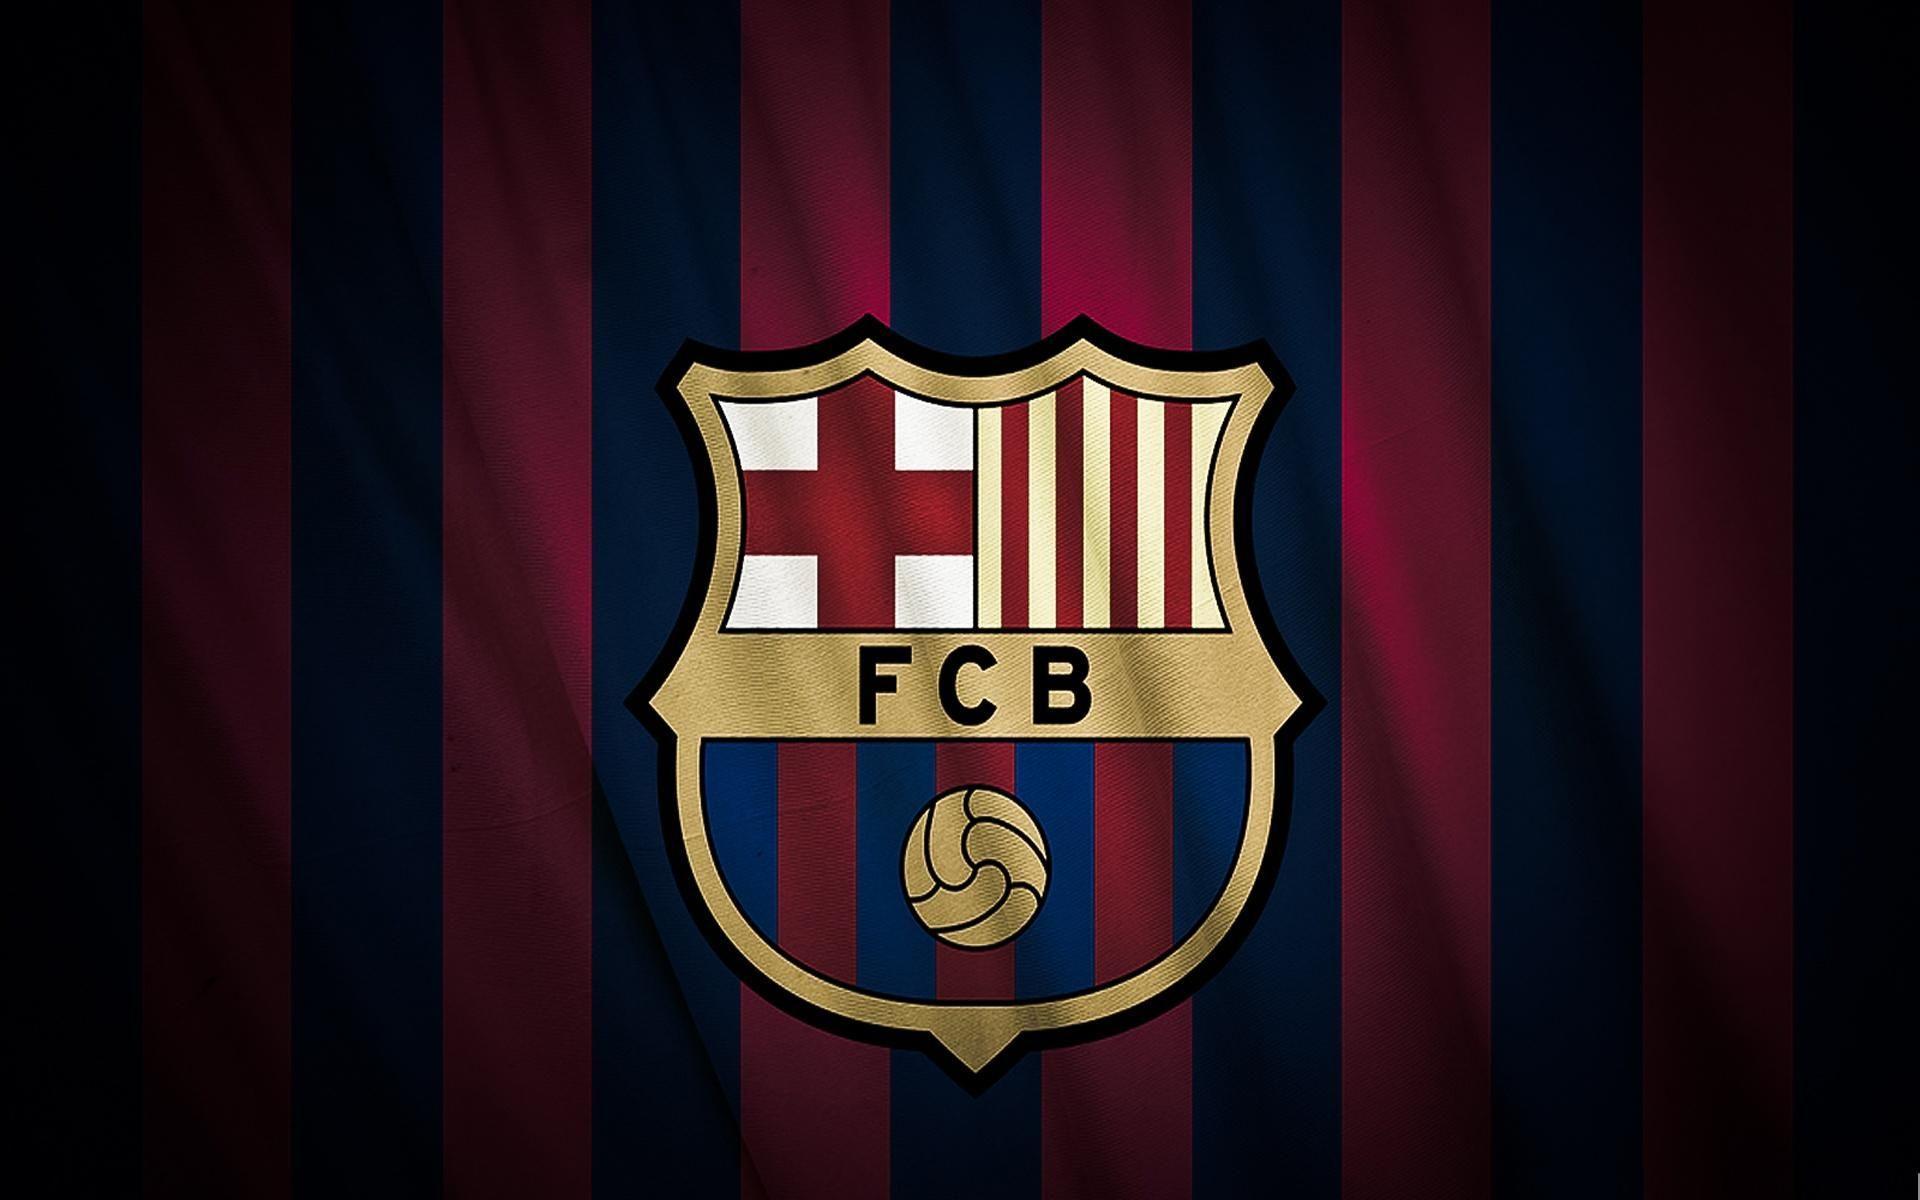 Barcelona Logo Wallpapers Top Free Barcelona Logo Backgrounds Wallpaperaccess